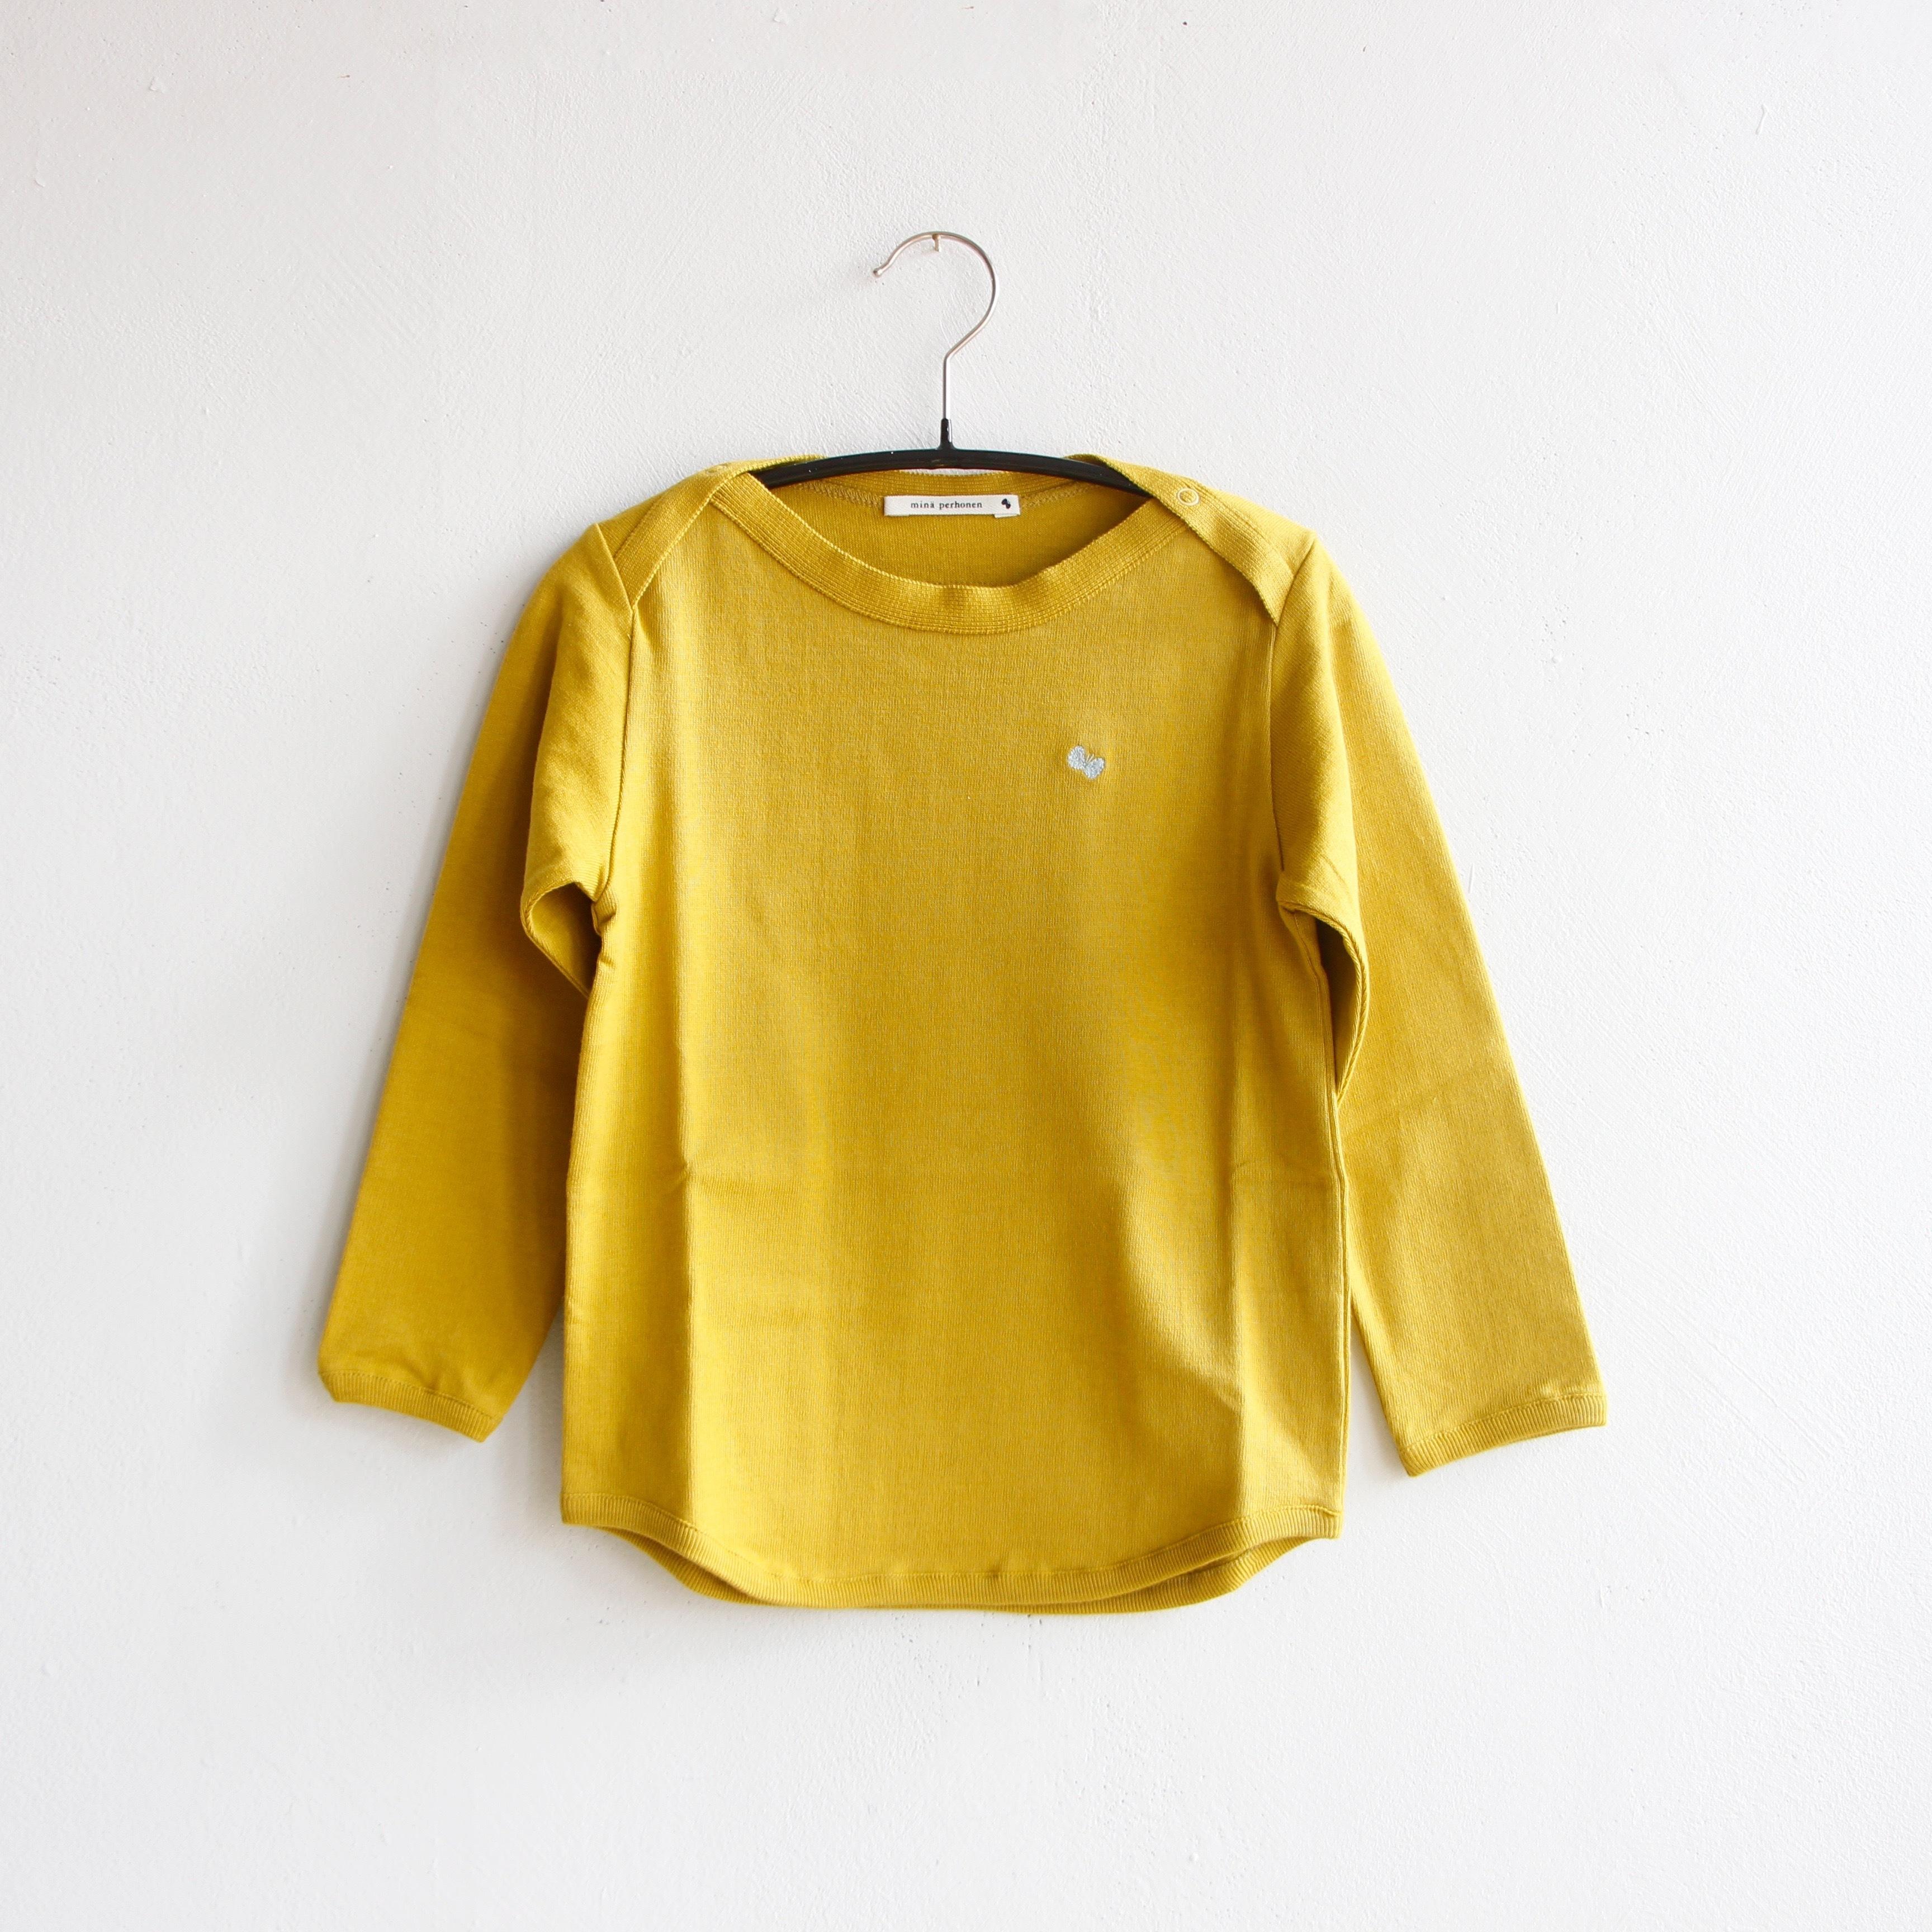 《mina perhonen 2020AW》zutto 長袖カットソー / mustard / 80-100cm